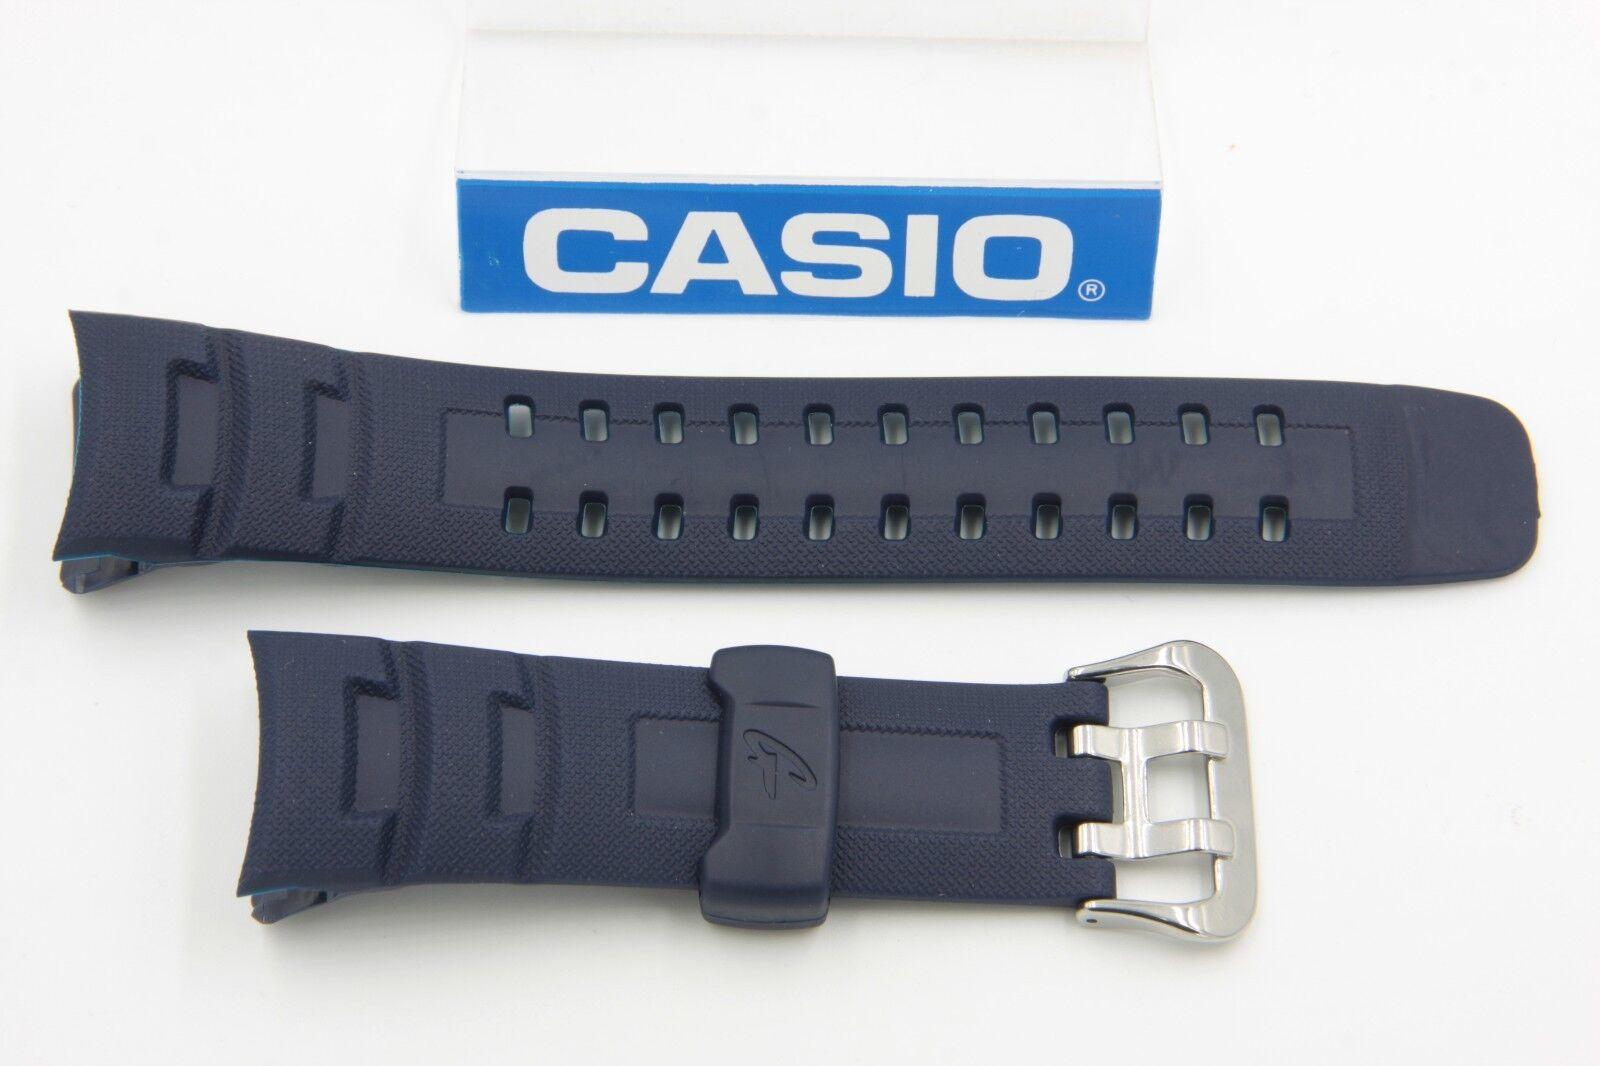 Casio Original G Shock Montre Bande G 7600 2 Bleu Sangle  HL4L6